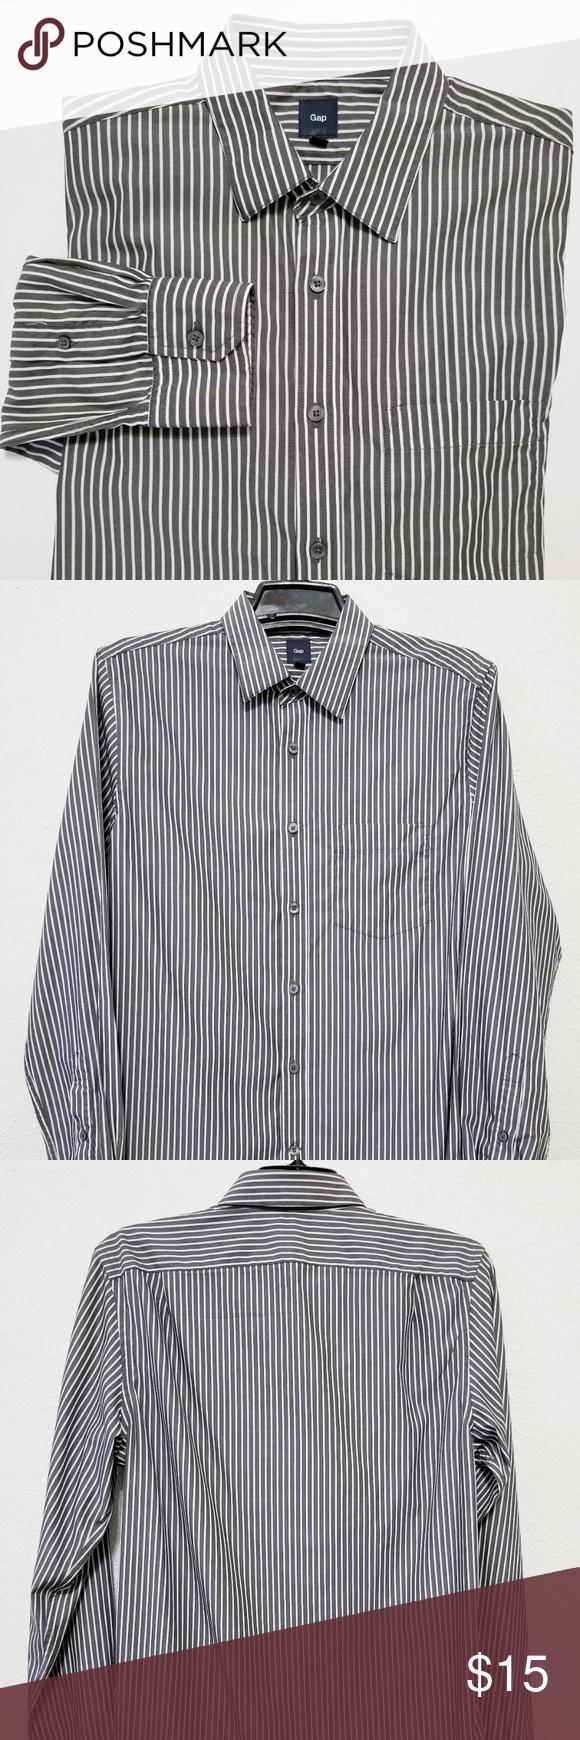 Gap Mens Gray White Striped Dress Shirt Gap Shirt Dress Shirt Dress White Striped Dress [ 1740 x 580 Pixel ]